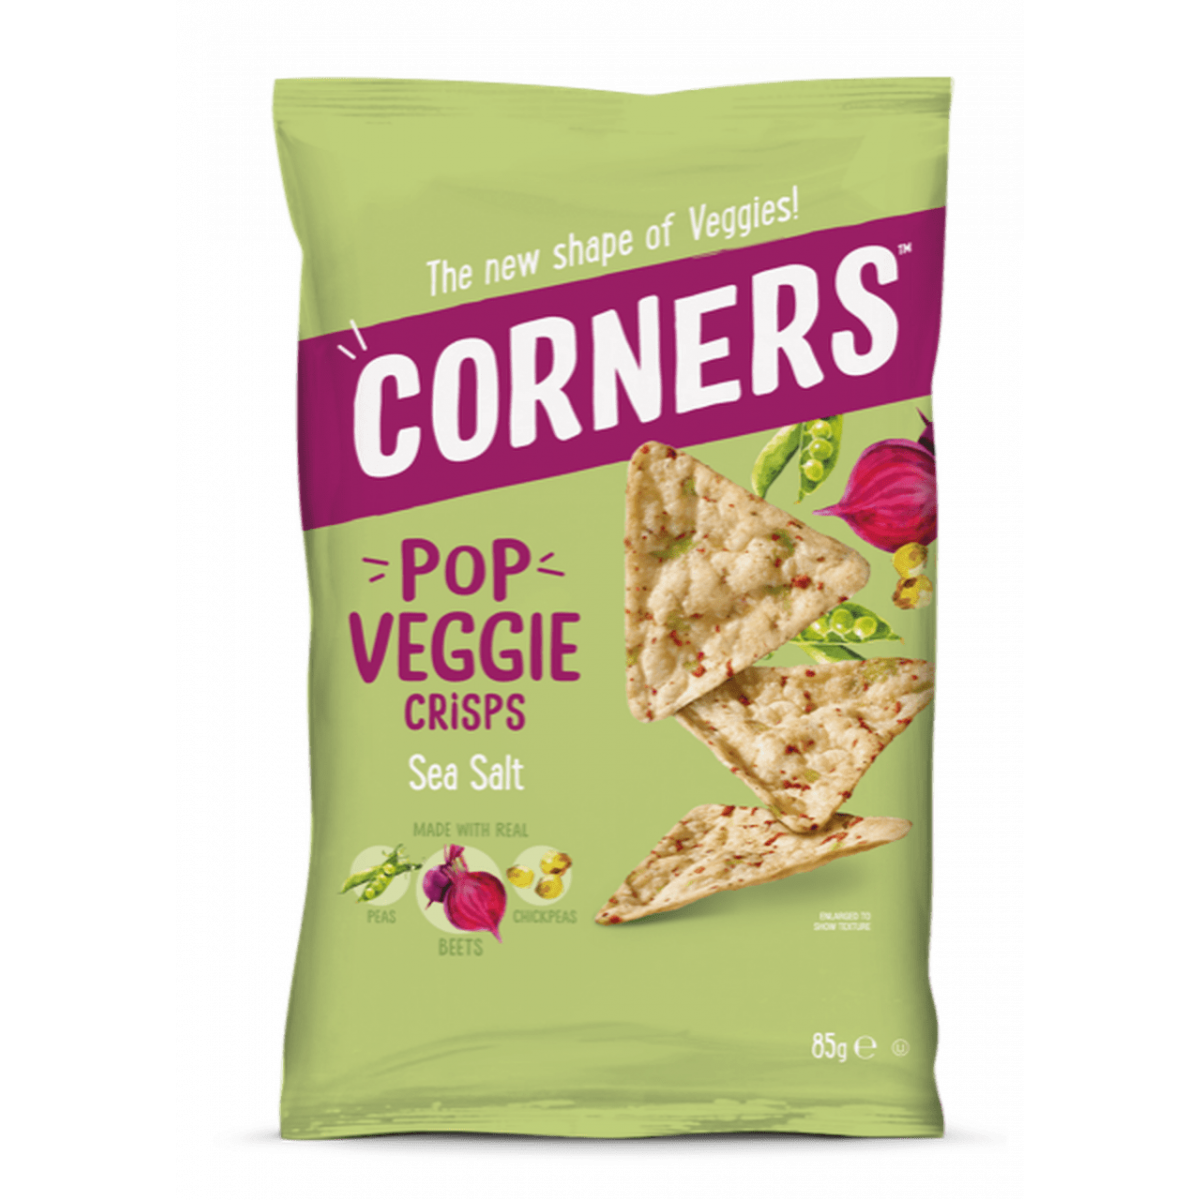 Pop Veggie Crisps Sea Salt